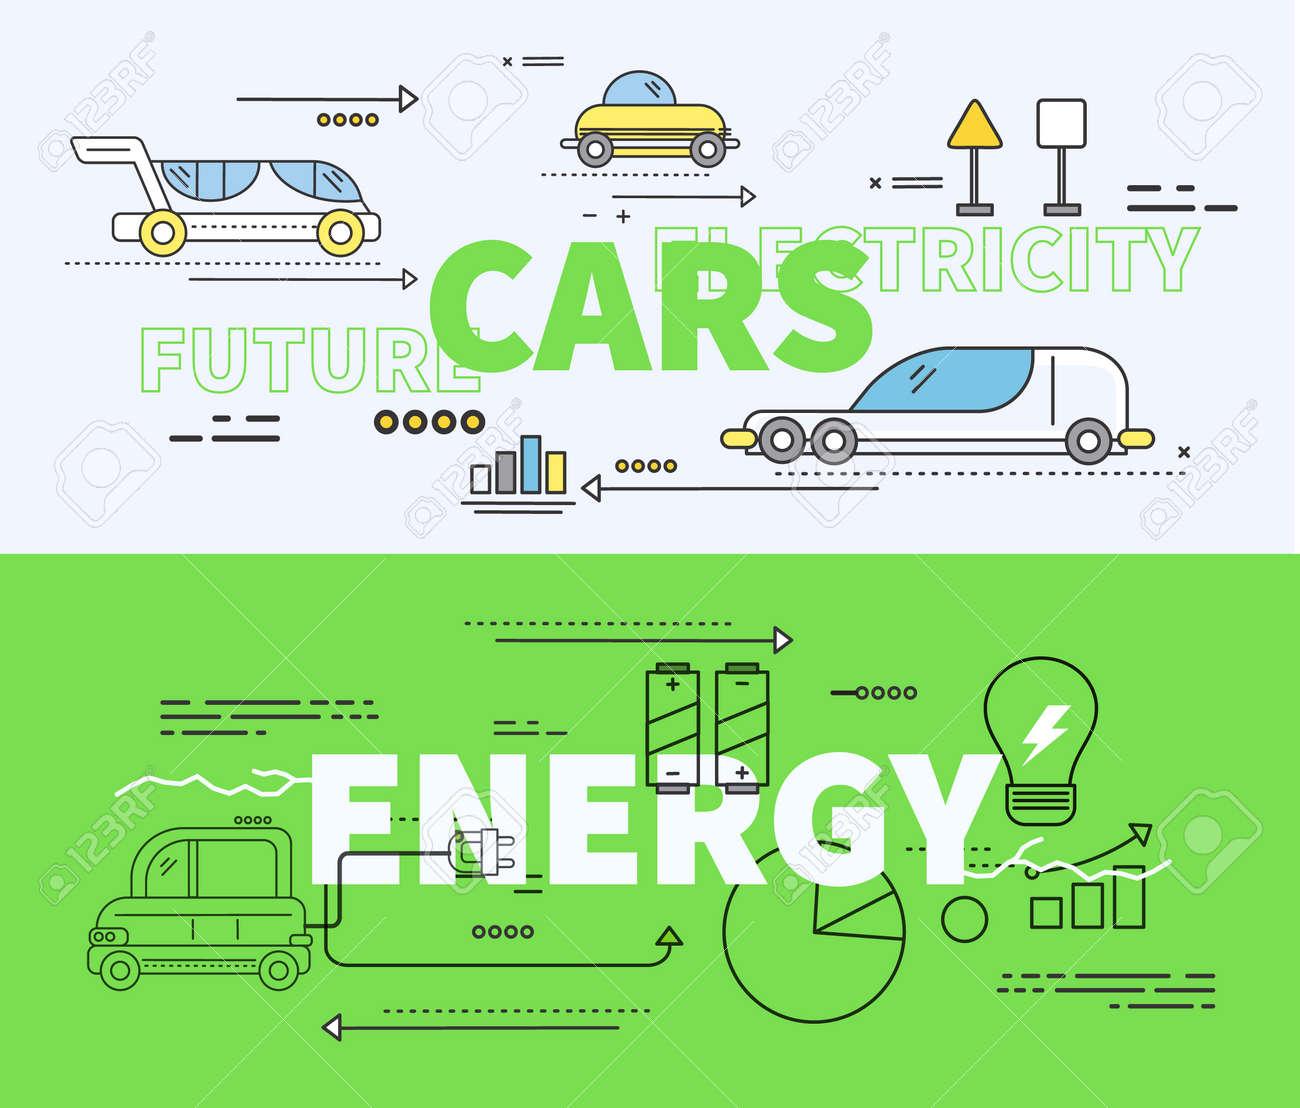 Green Car Diagram Wiring Diagrams Exterior Of Future Energy Electricity Rh 123rf Com